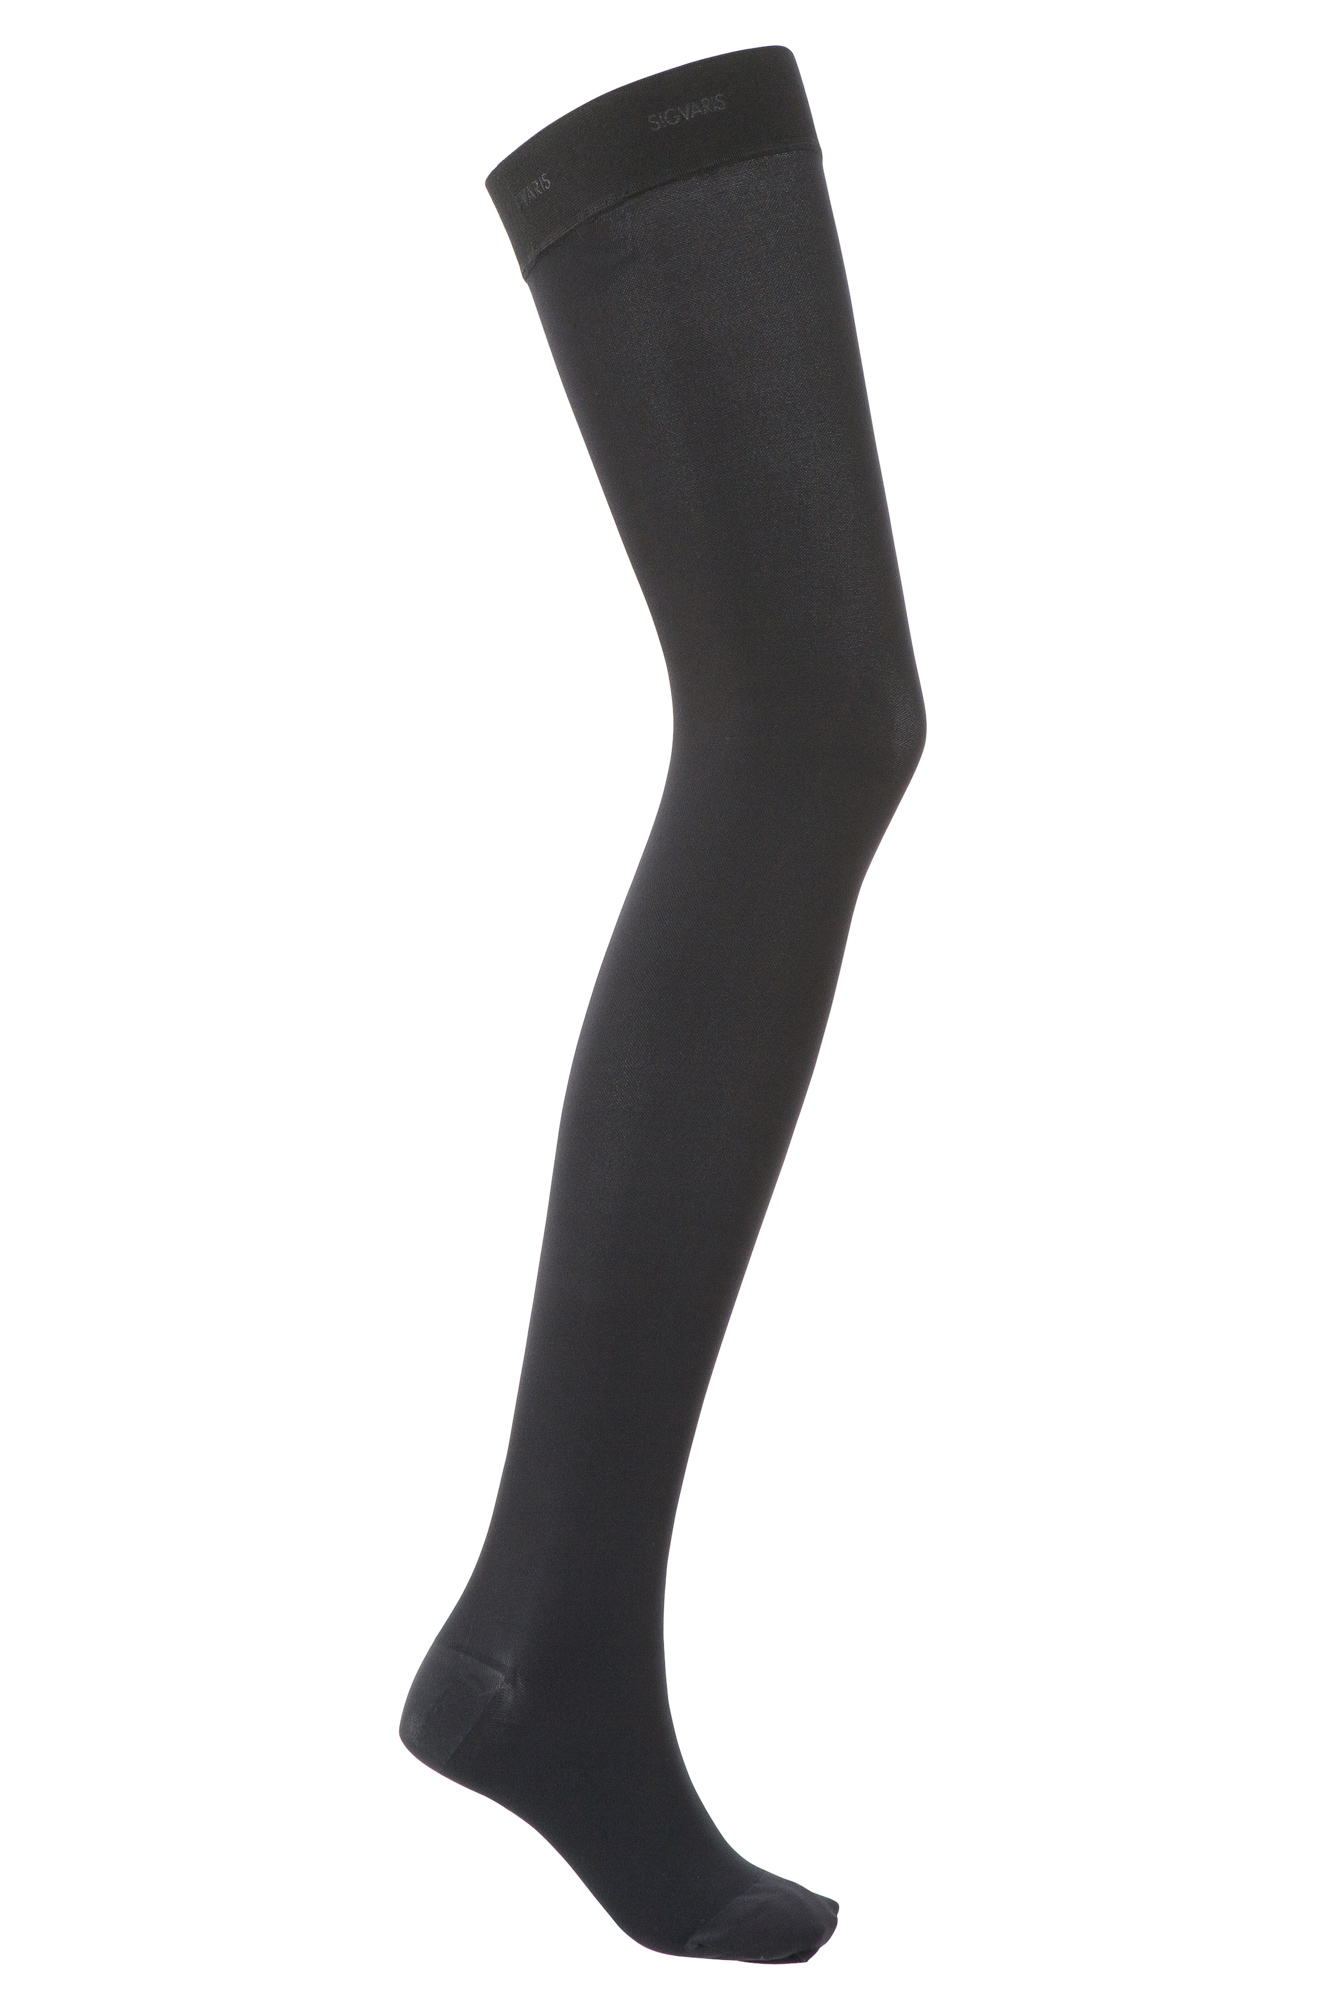 Sigvaris Comfort Class 1 Thigh Length Compression Stockings Savannah XS Regular Long Open Toe